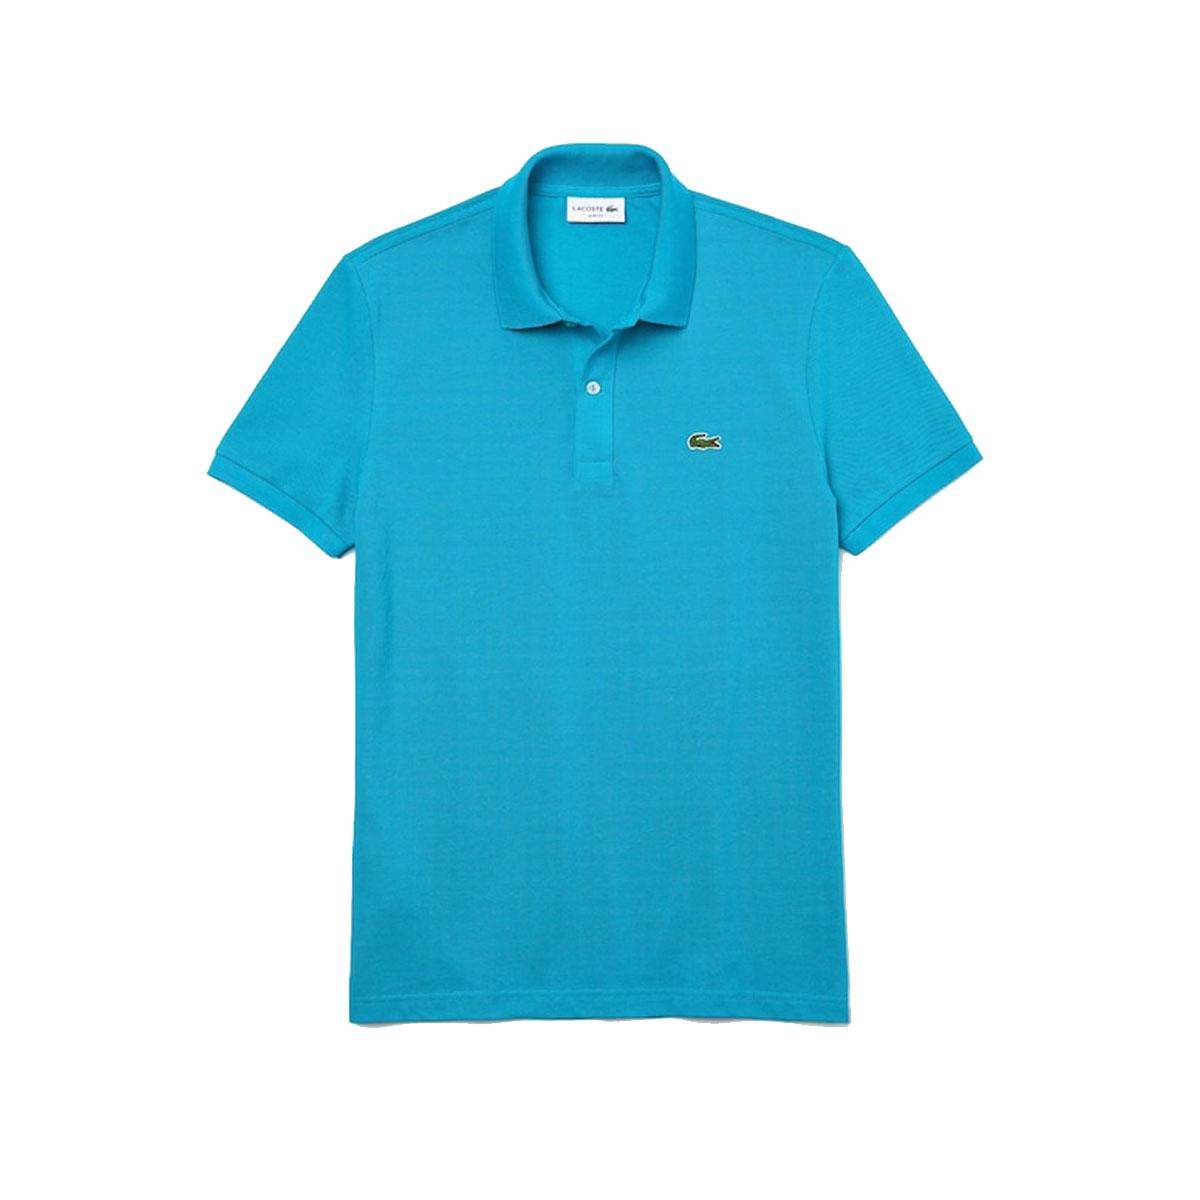 Lacoste Slim Fit Polo PH4012-HDB Blauw-M maat M